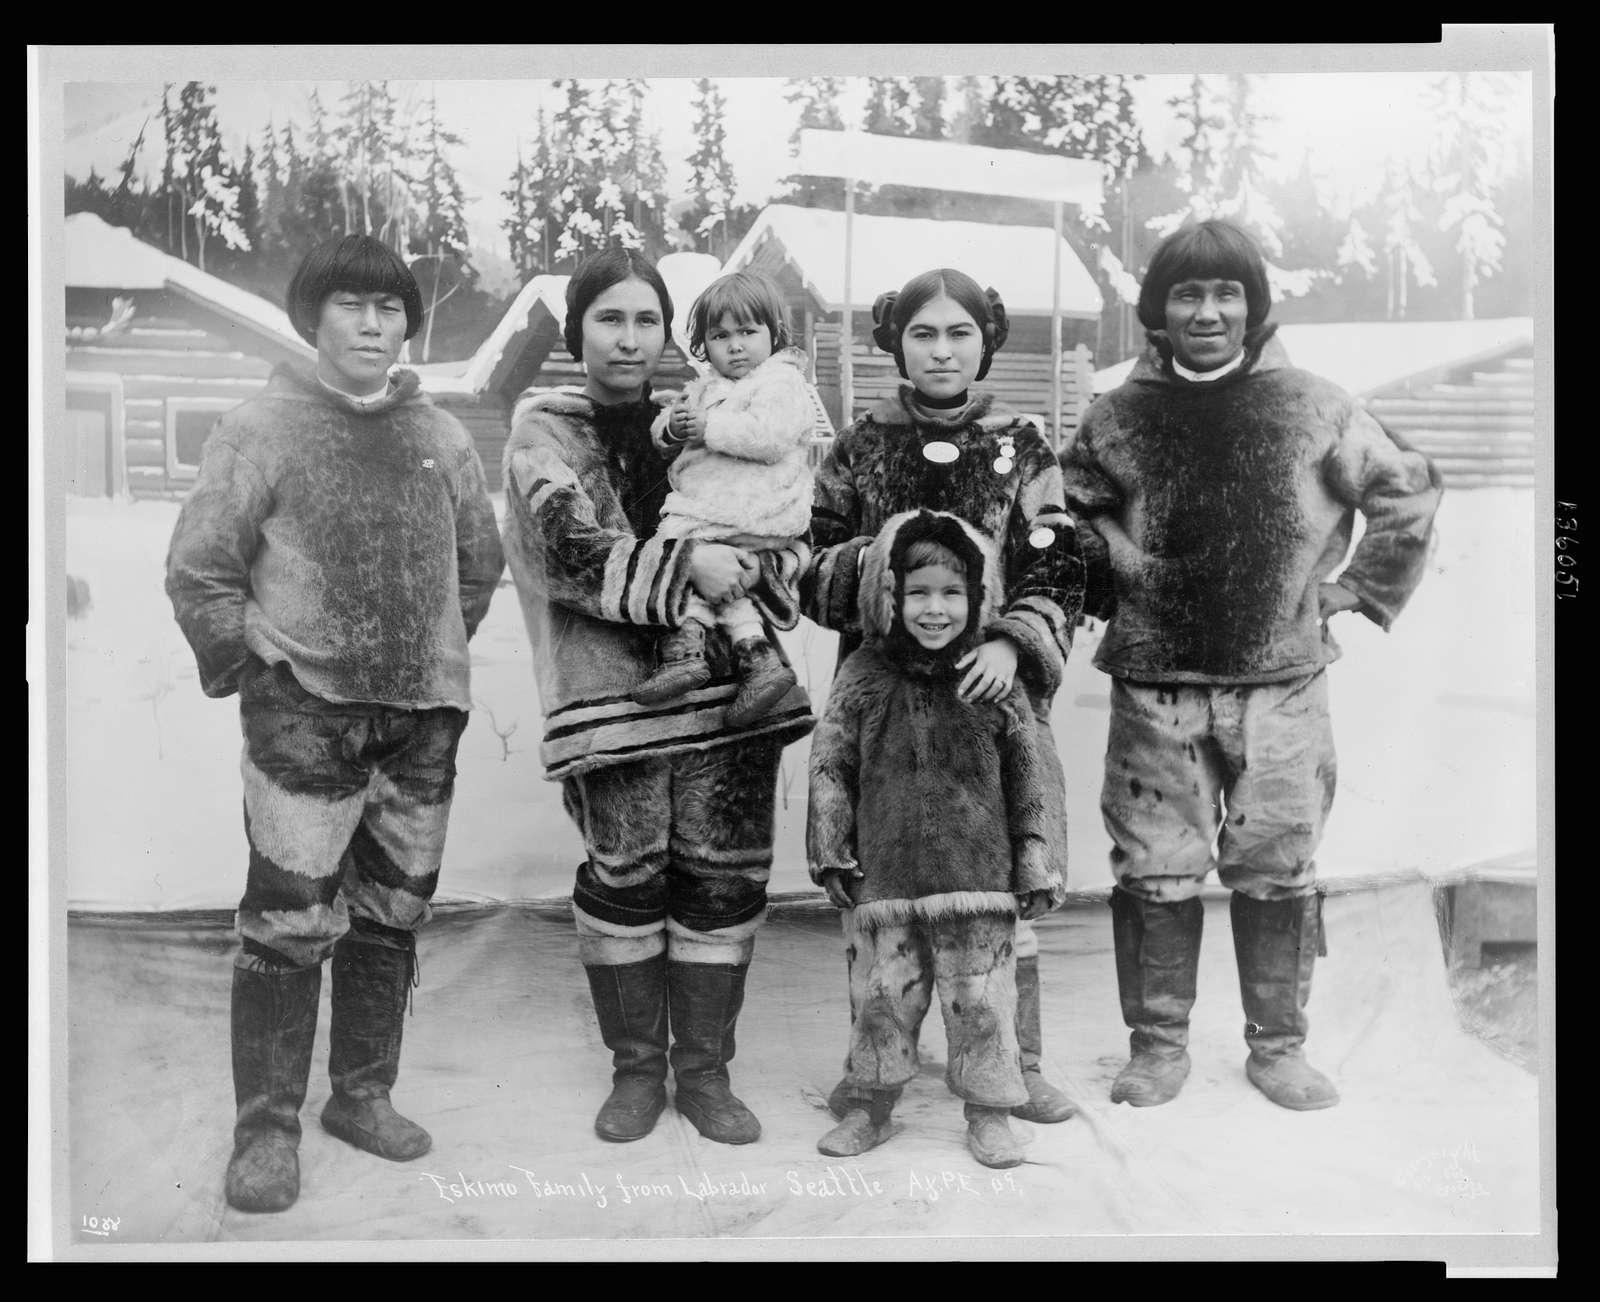 Eskimo family from Labrador Seattle A.Y.P.E.